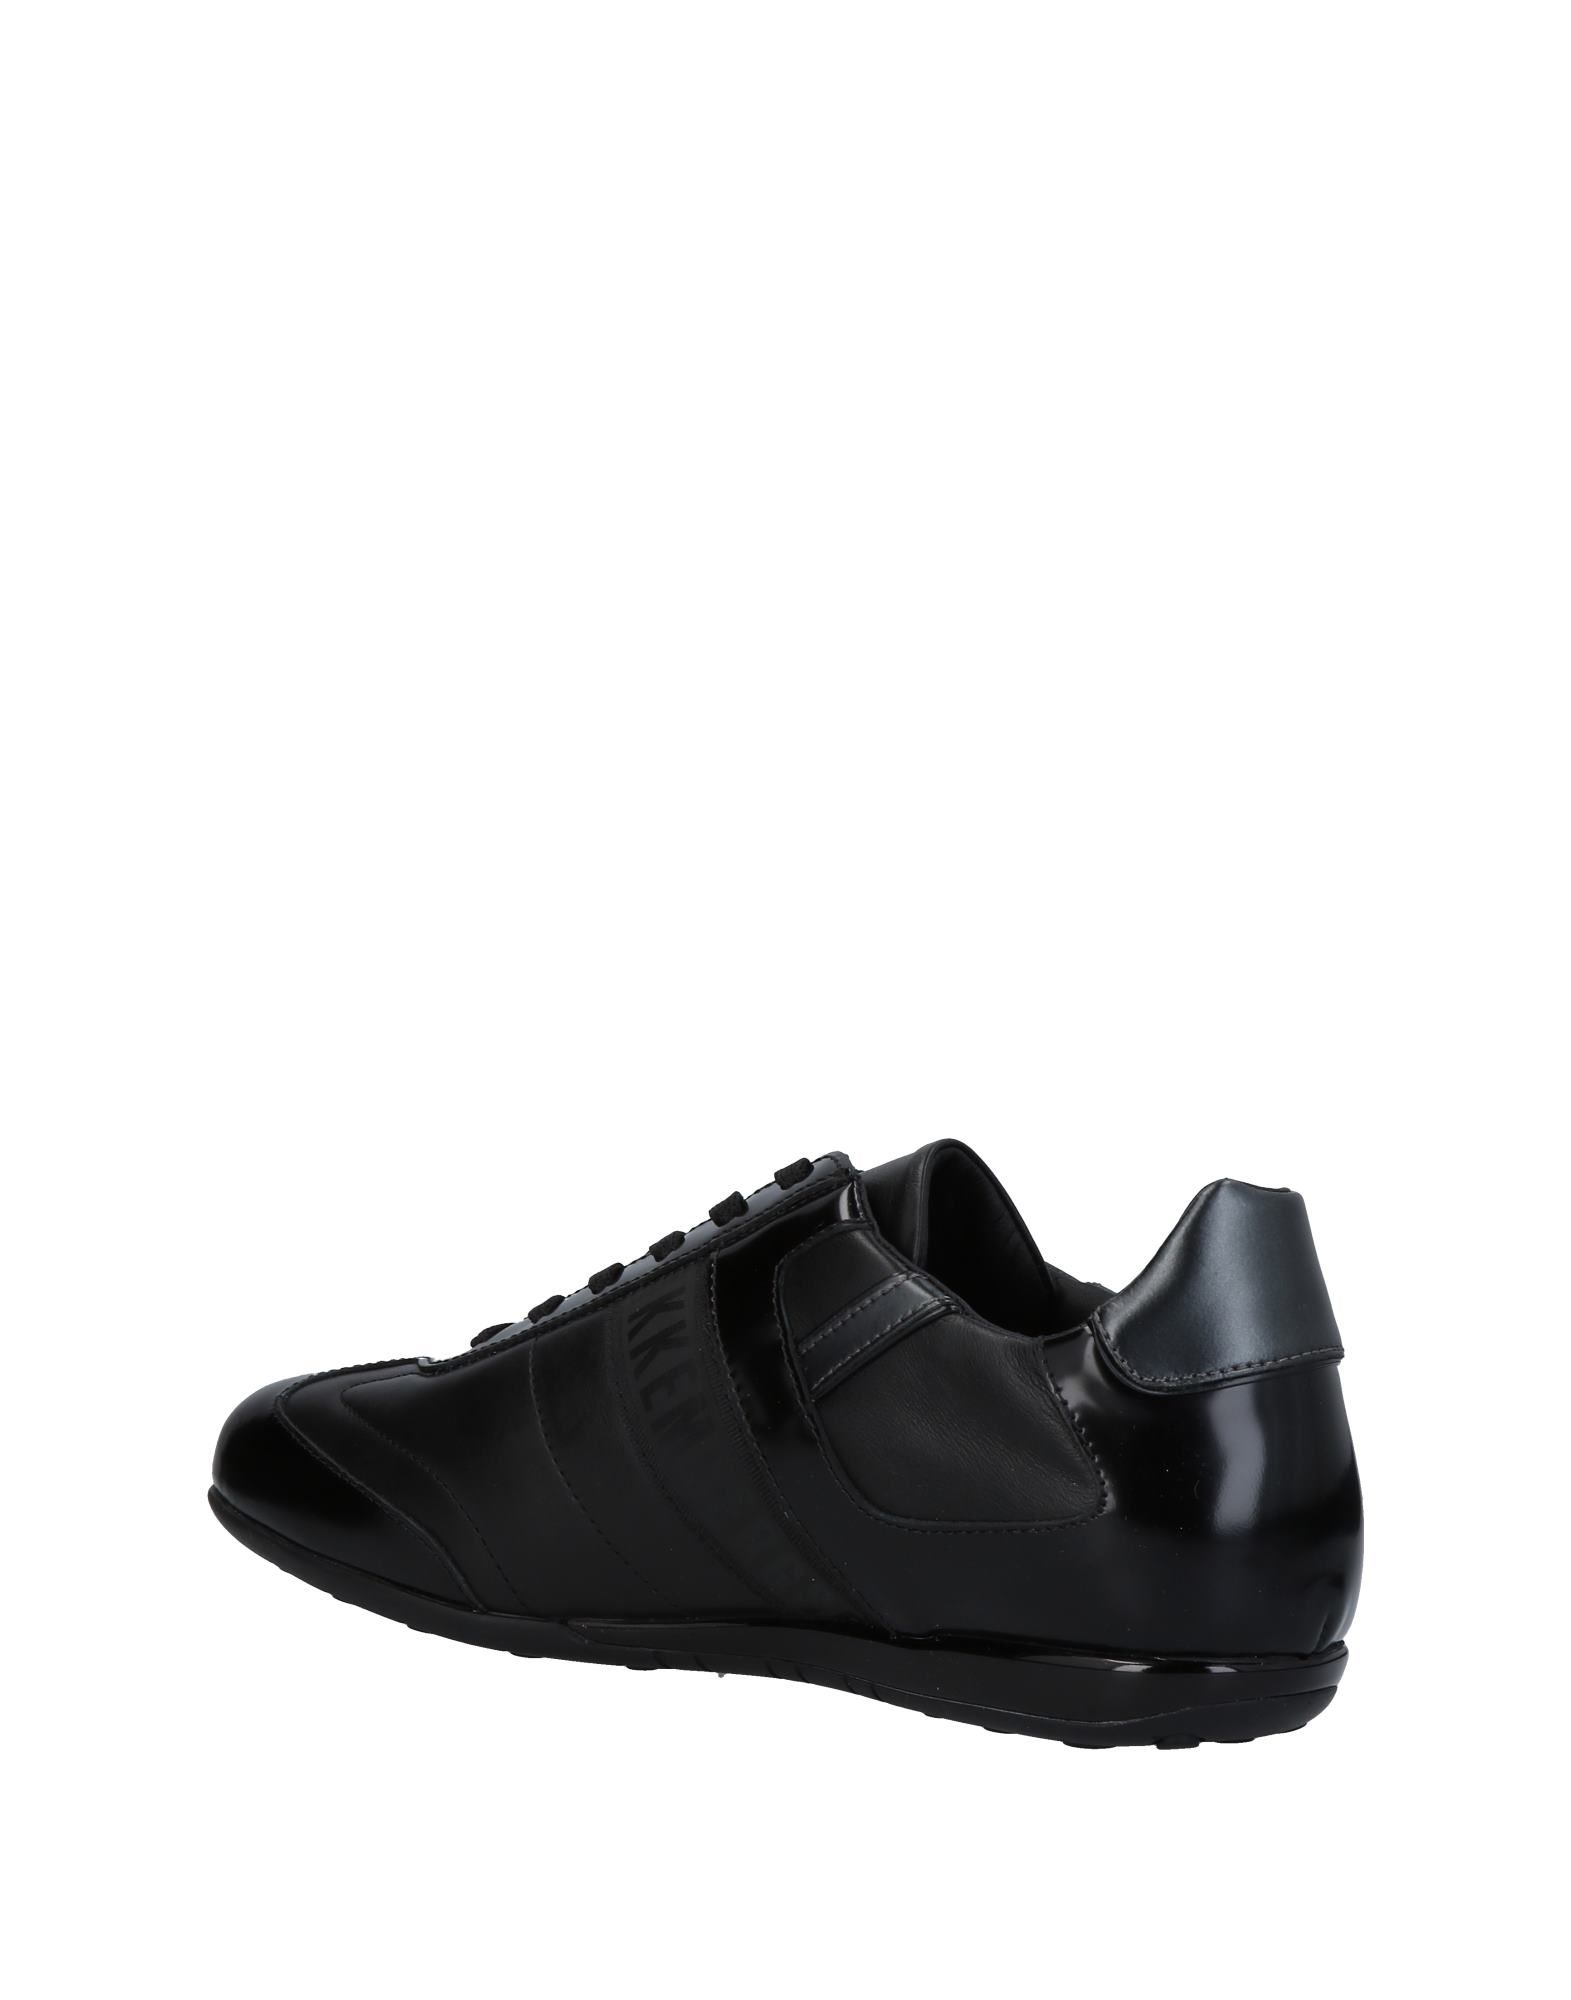 Bikkembergs Sneakers Herren  11450660KI Gute Qualität beliebte Schuhe